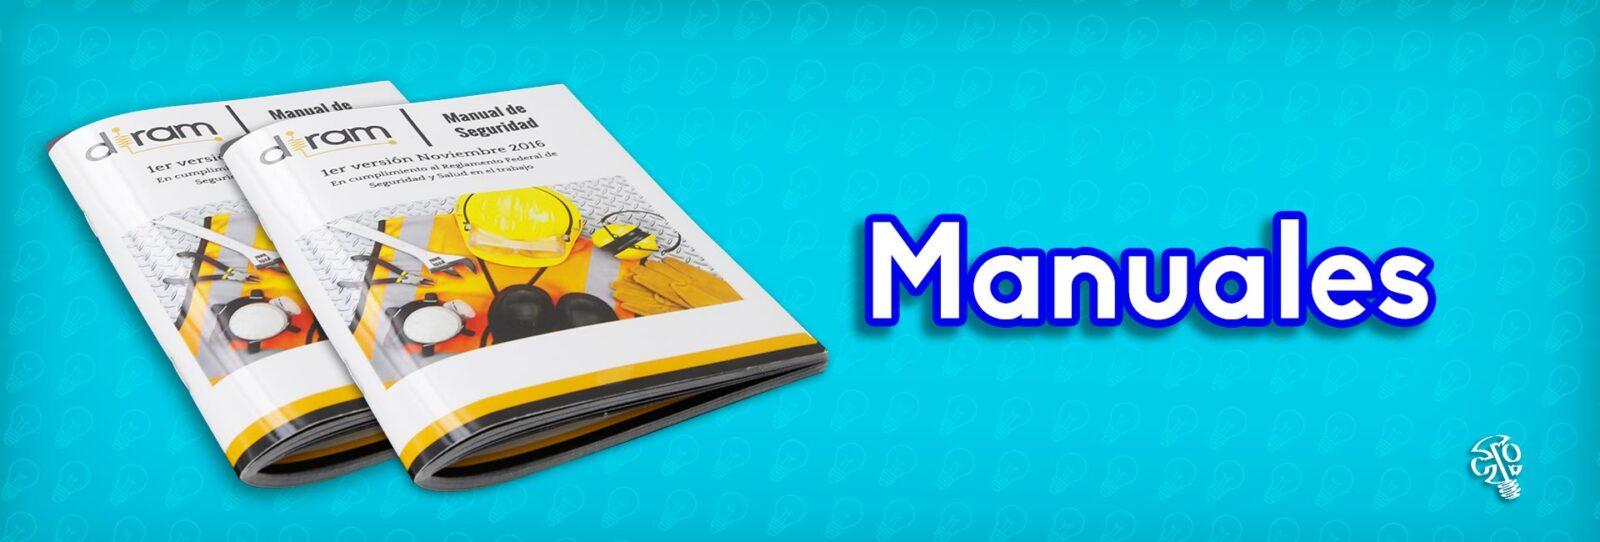 b_8_Papeleria_Manuales